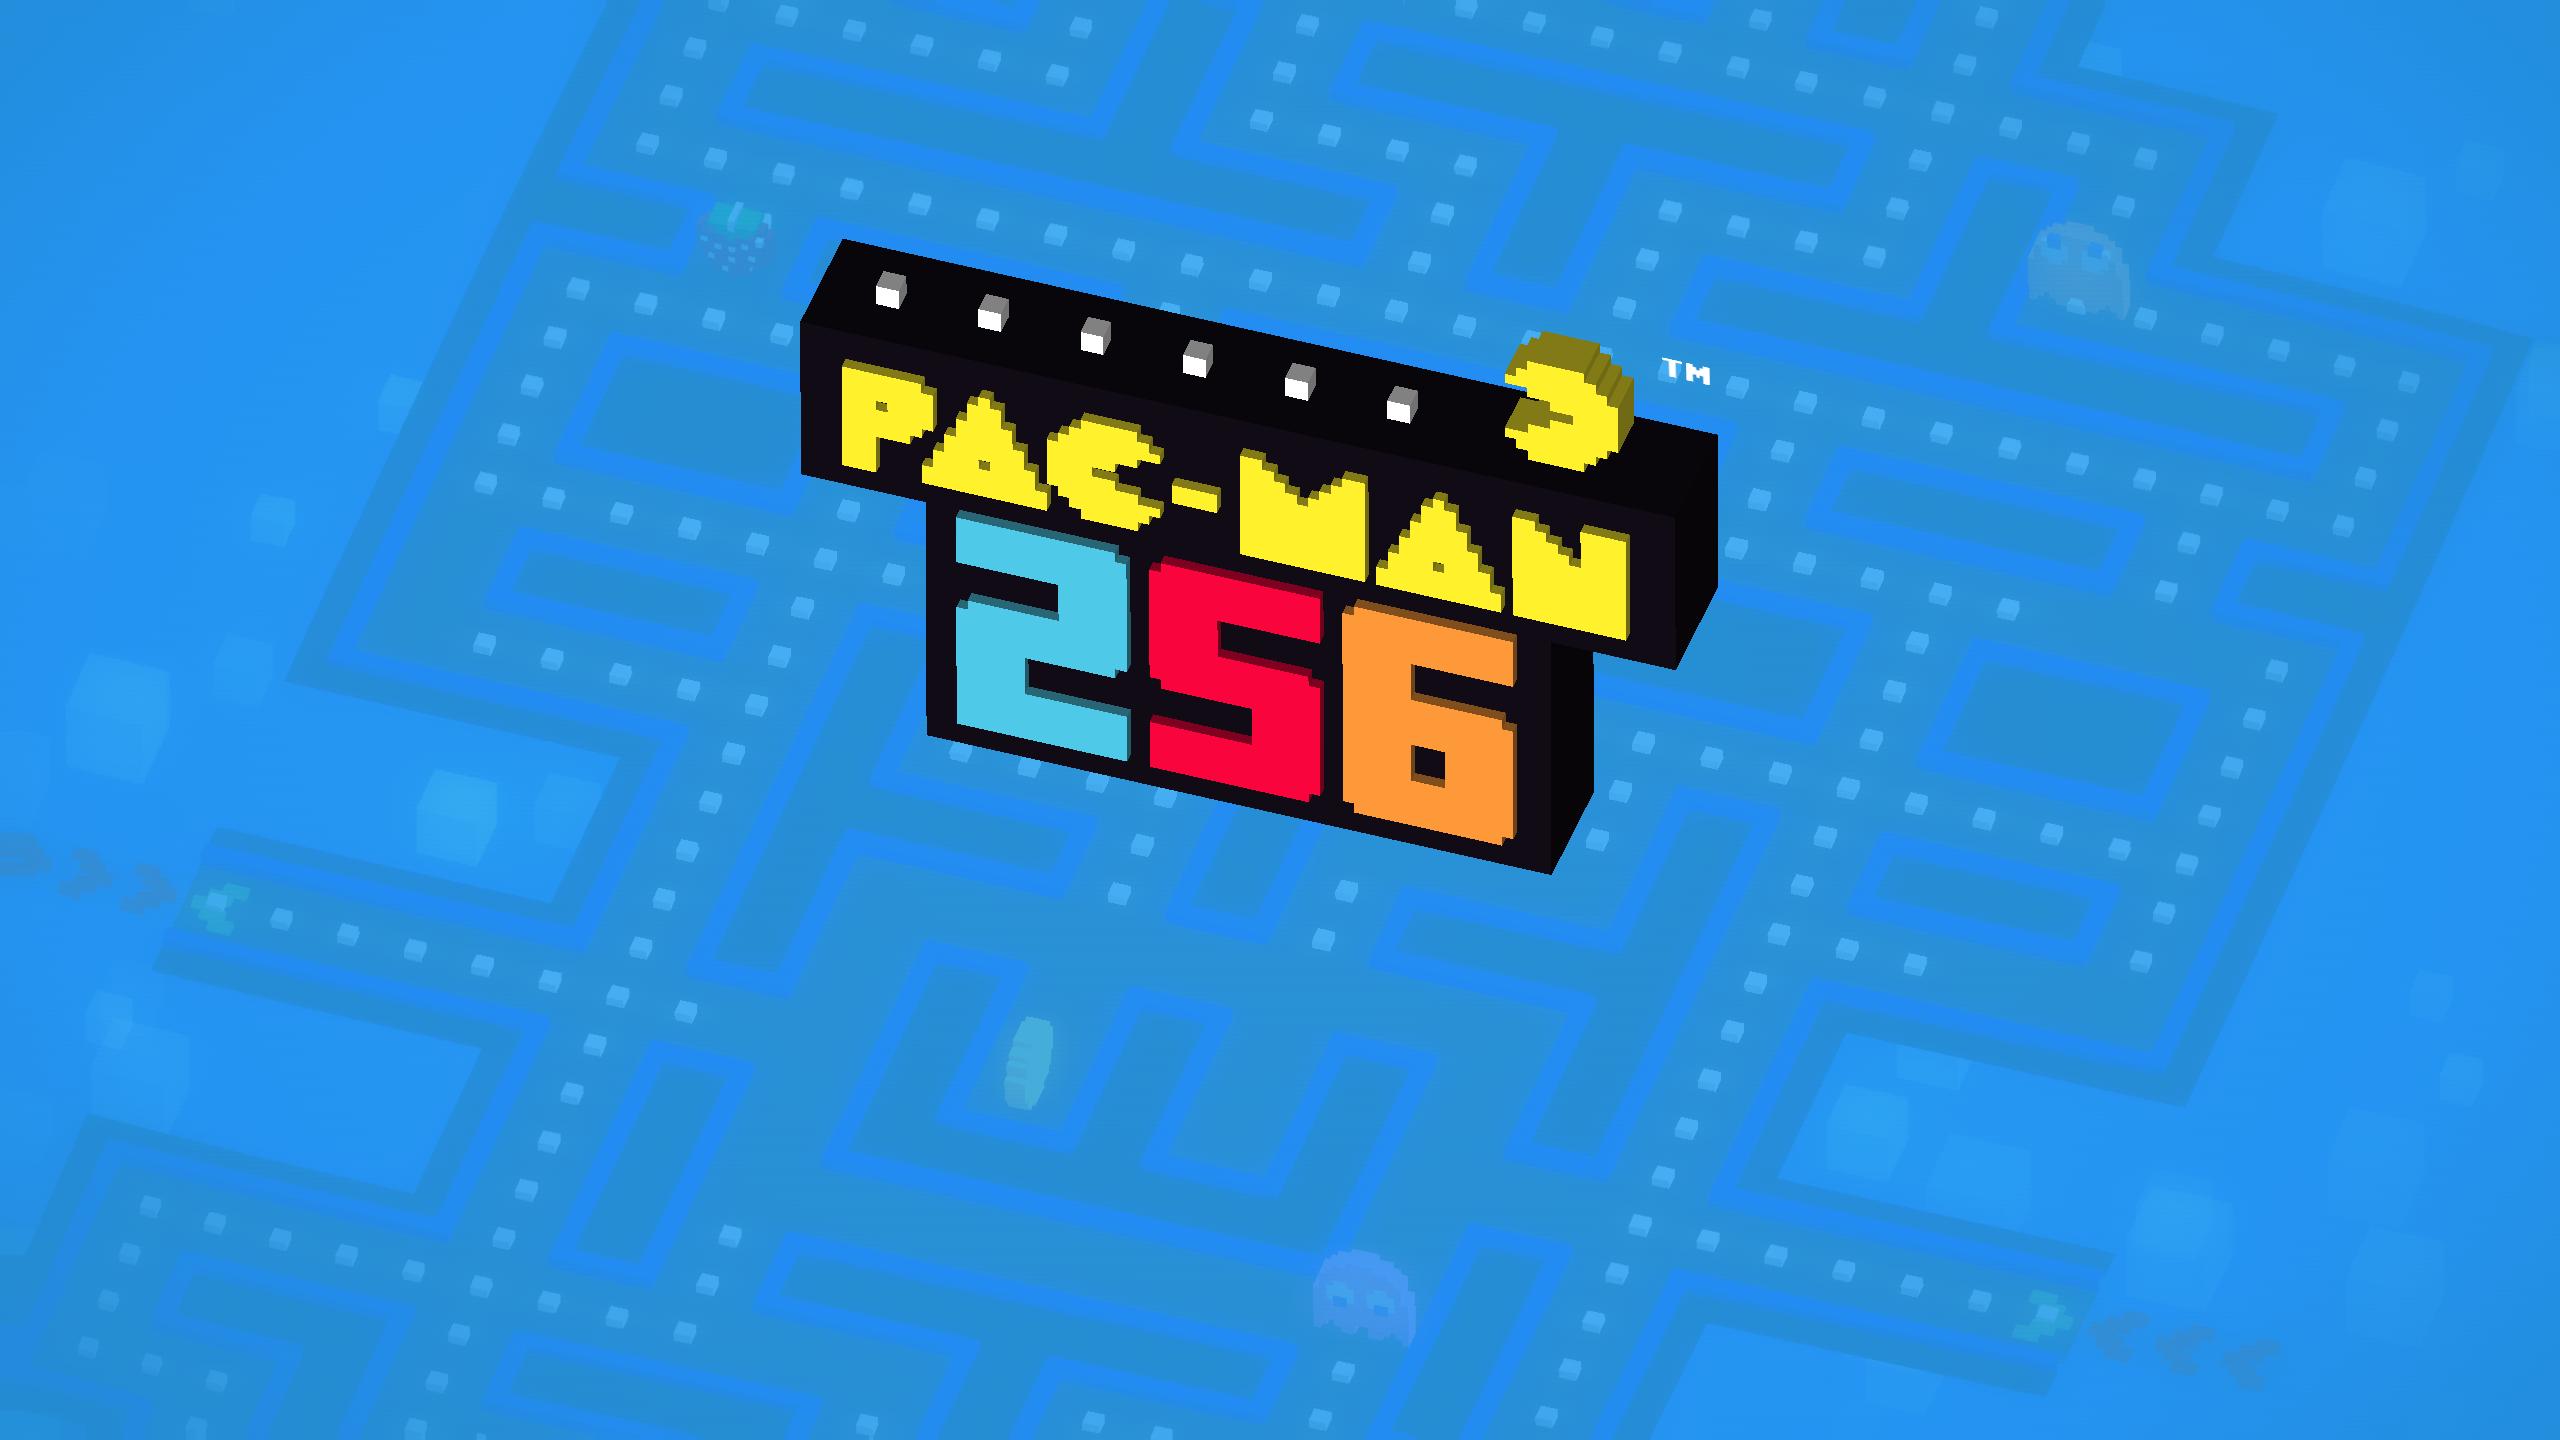 PACMAN 256 title